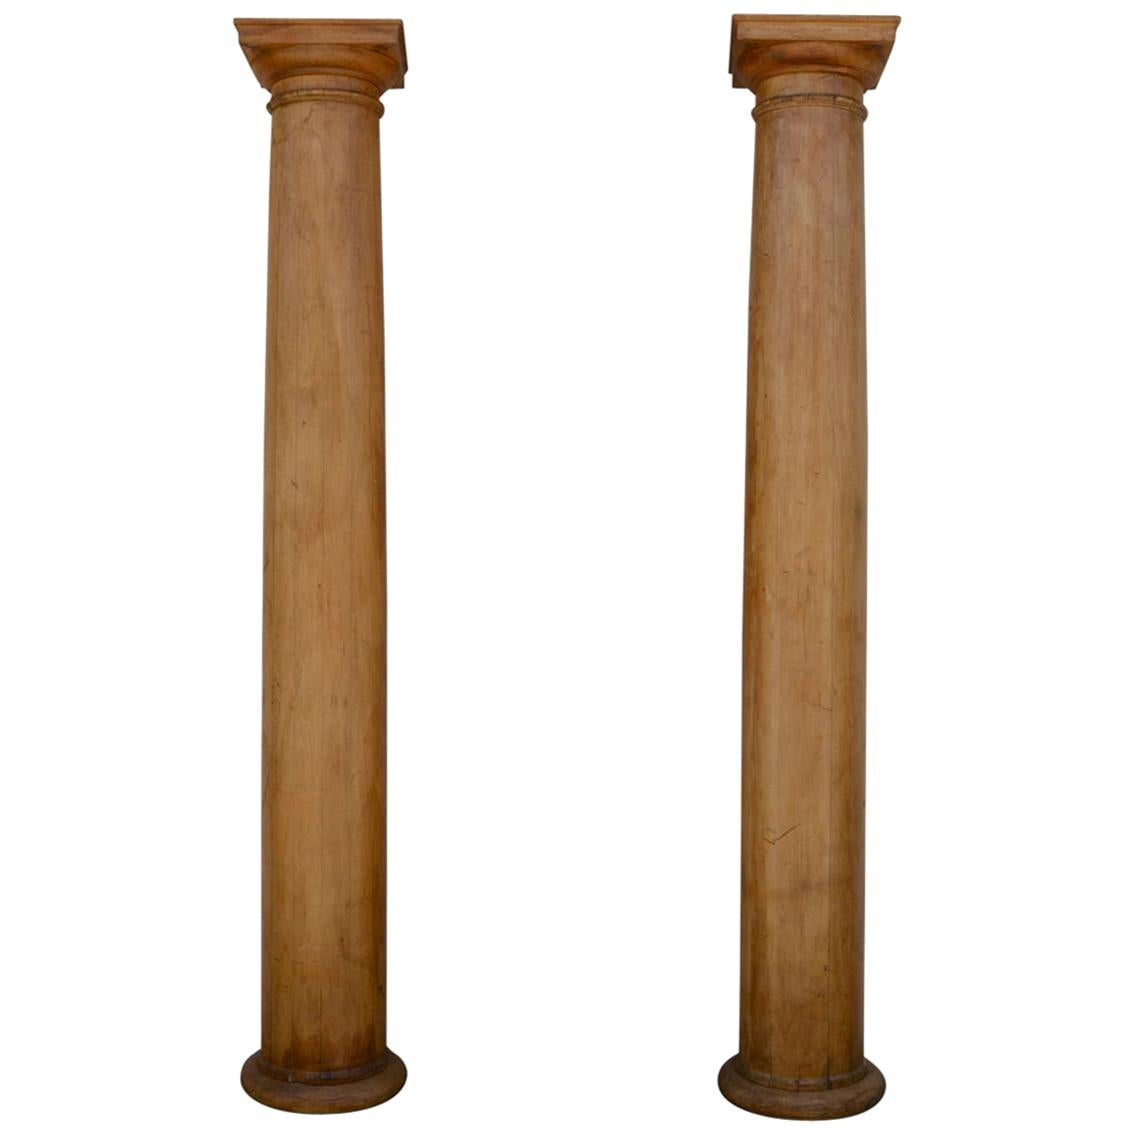 Pair of Elegant Tall Fluted Decorative Pine Columns